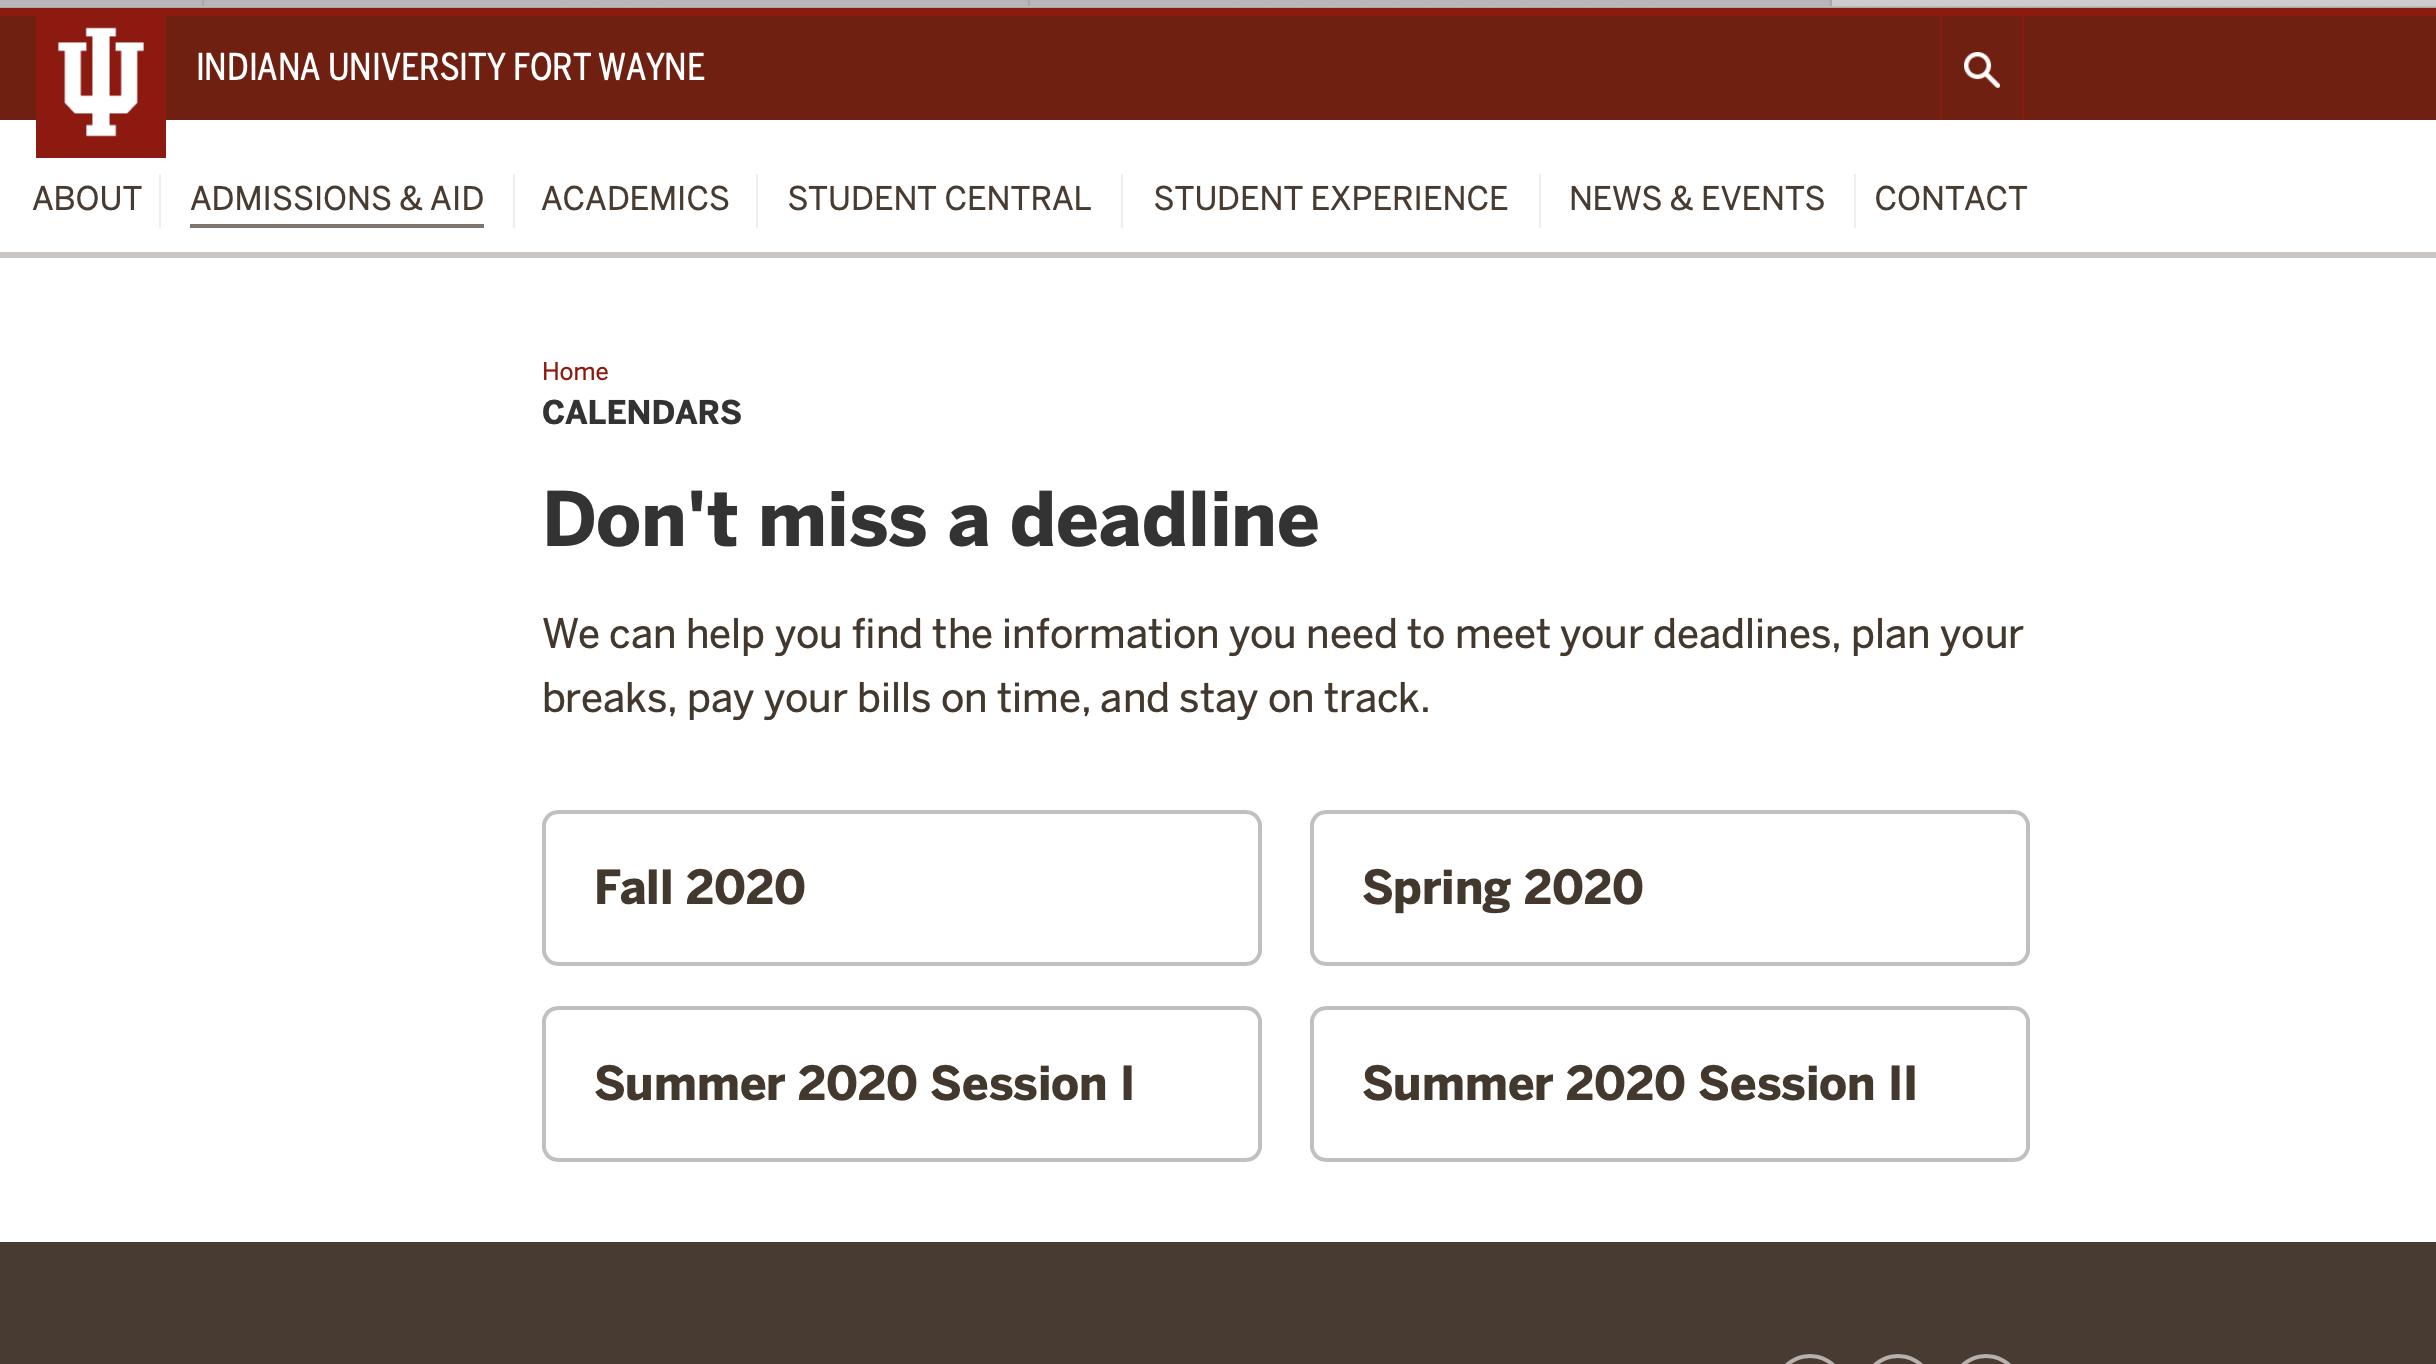 Iu Academic Calendar Spring 2022.Academic Calendar Iu Fort Wayne One Iu